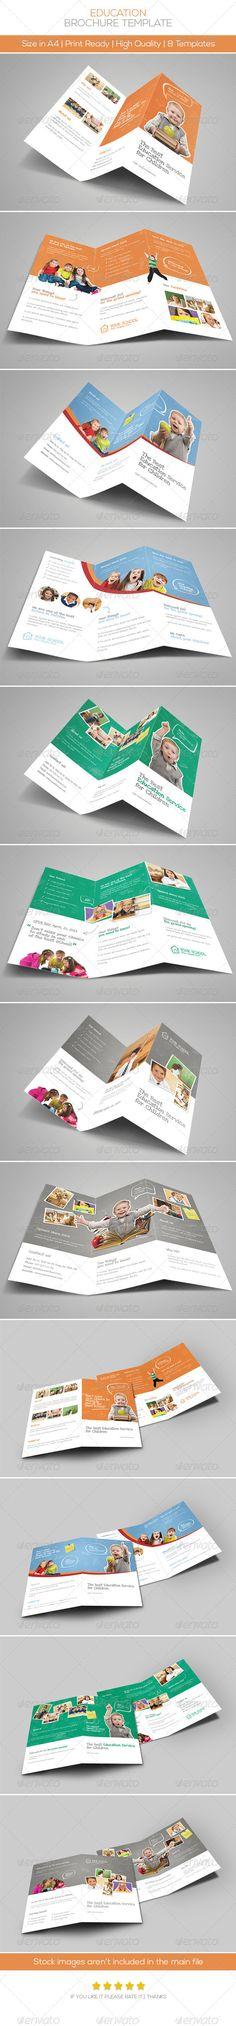 Premium+Education+Brochure+Tri-fold+&+Bi-fold